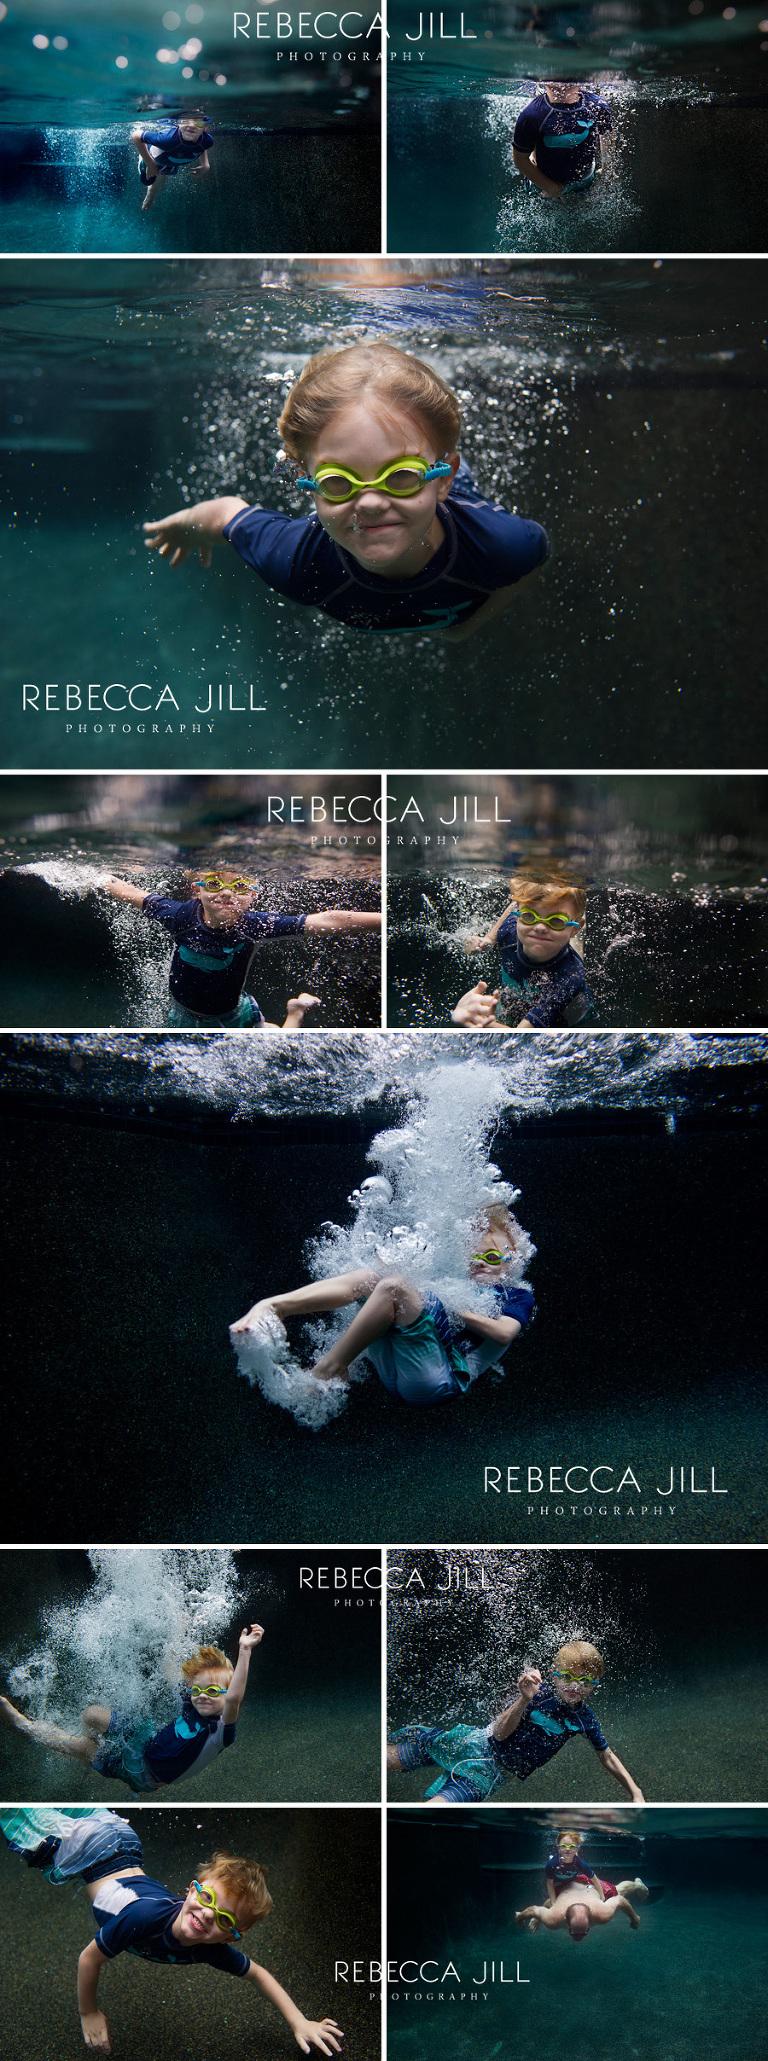 Rebecca Jill Photography